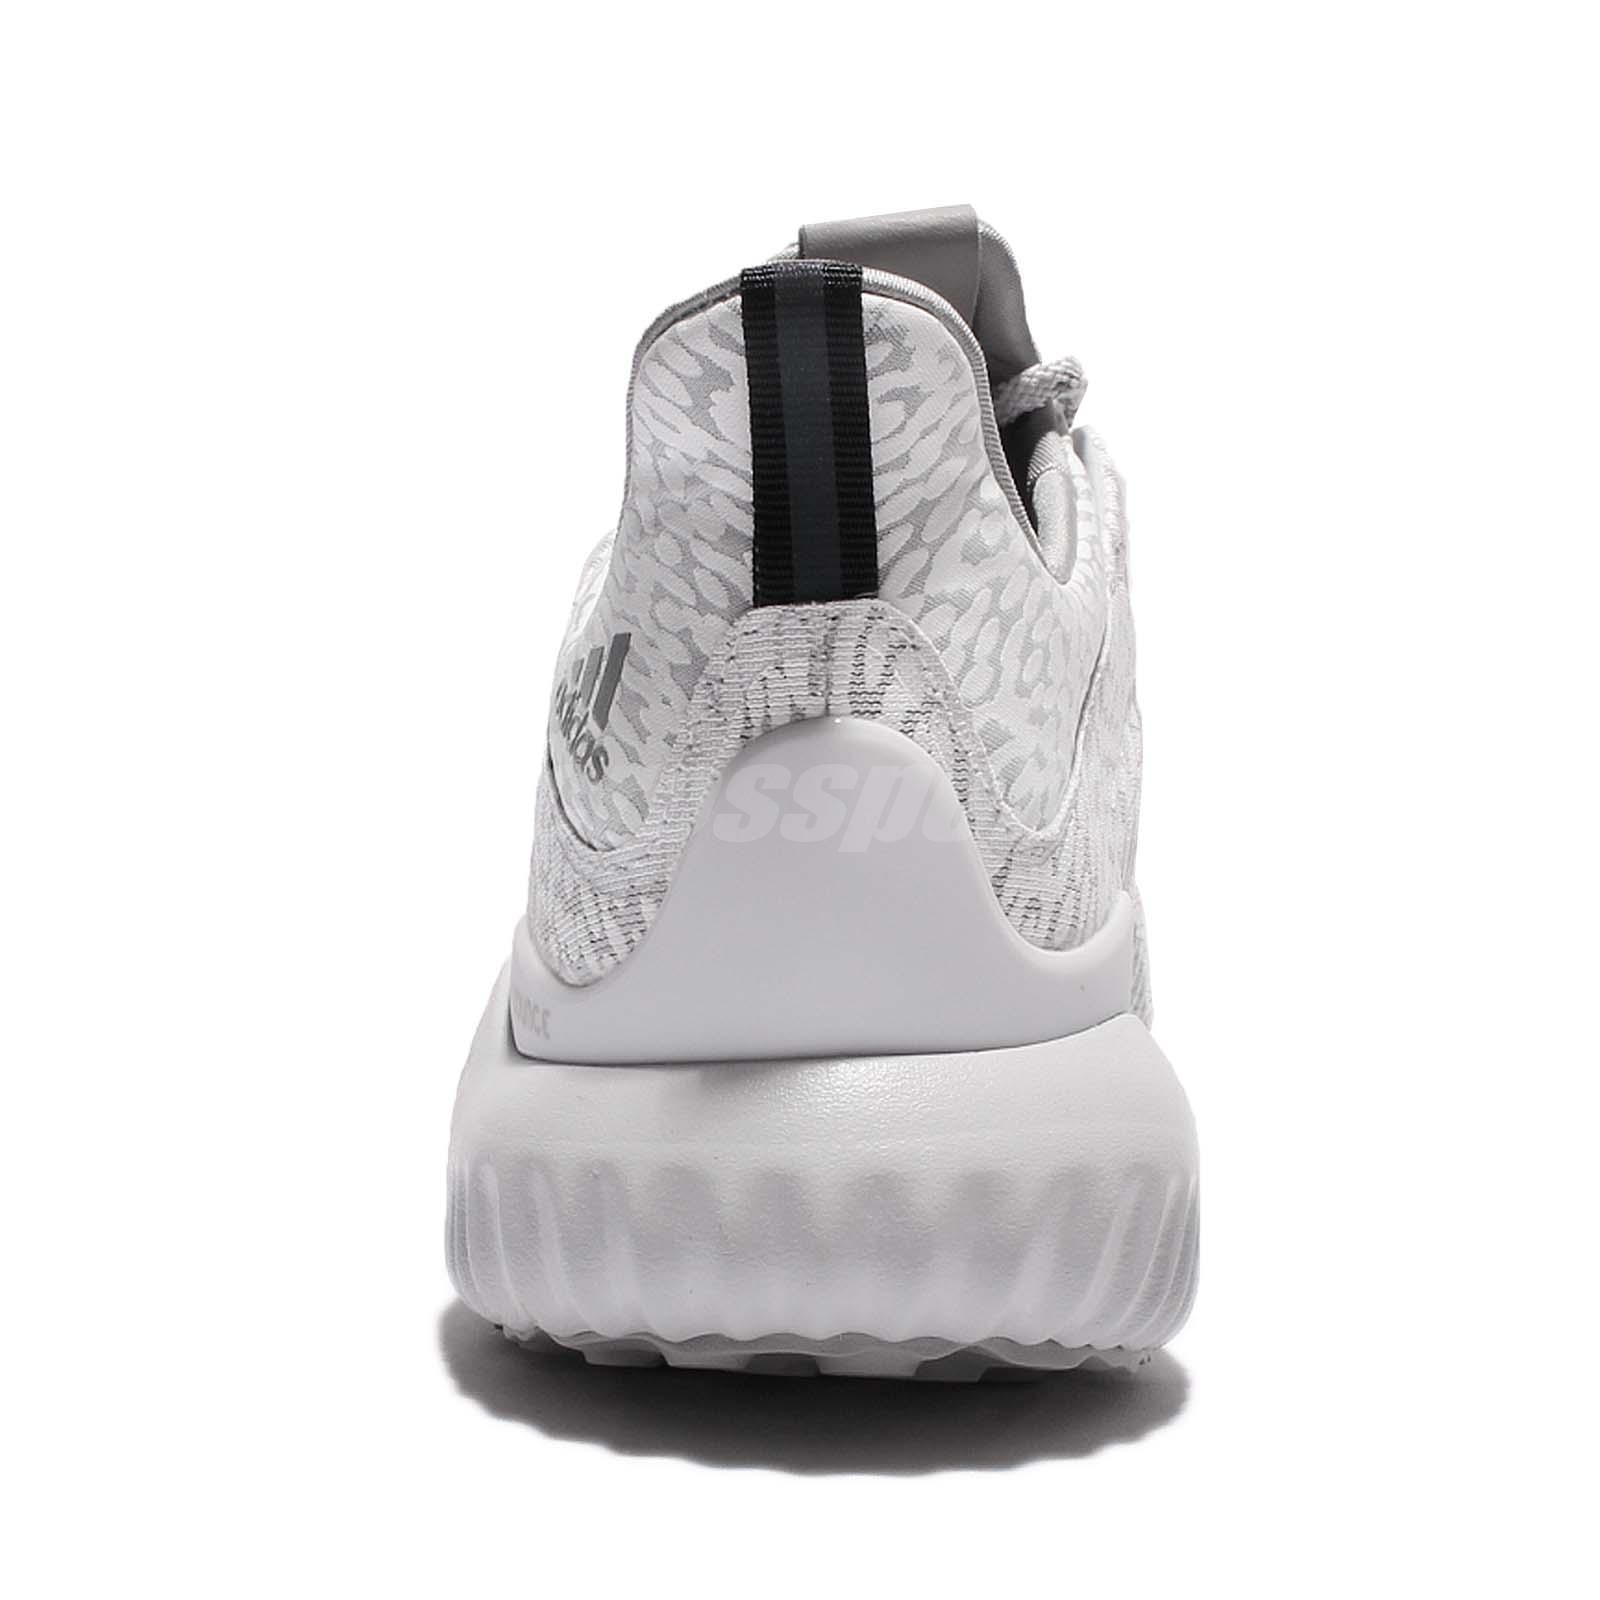 276f9b85b9952 красный серый adidas alphabounce instinct classic sneaker 76bcf ...